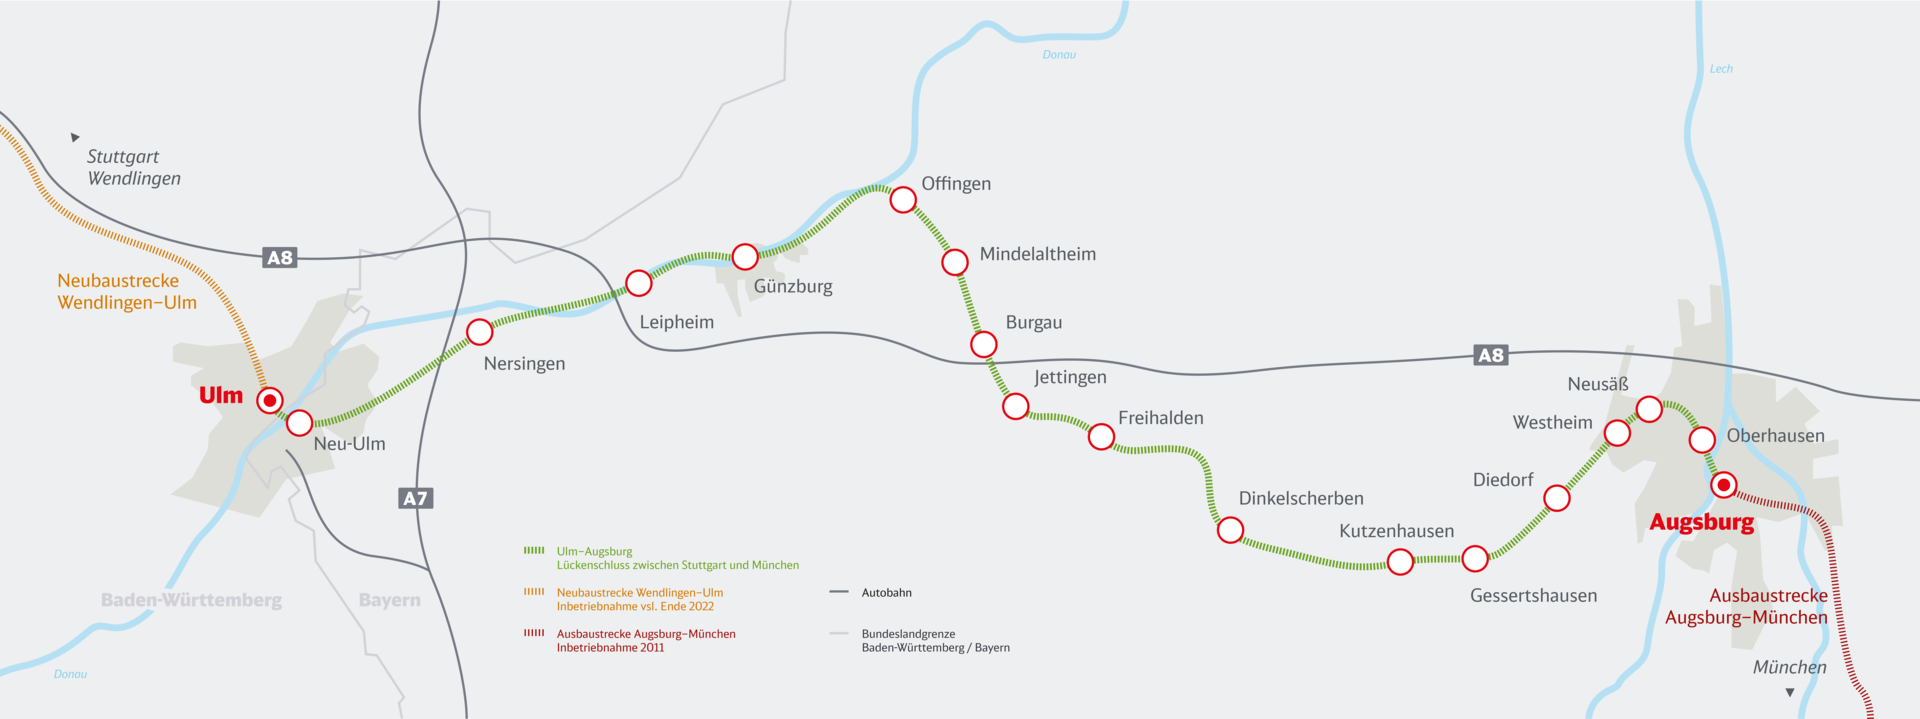 Streckenkarte Bahnprojekt Ulm-Augsburg